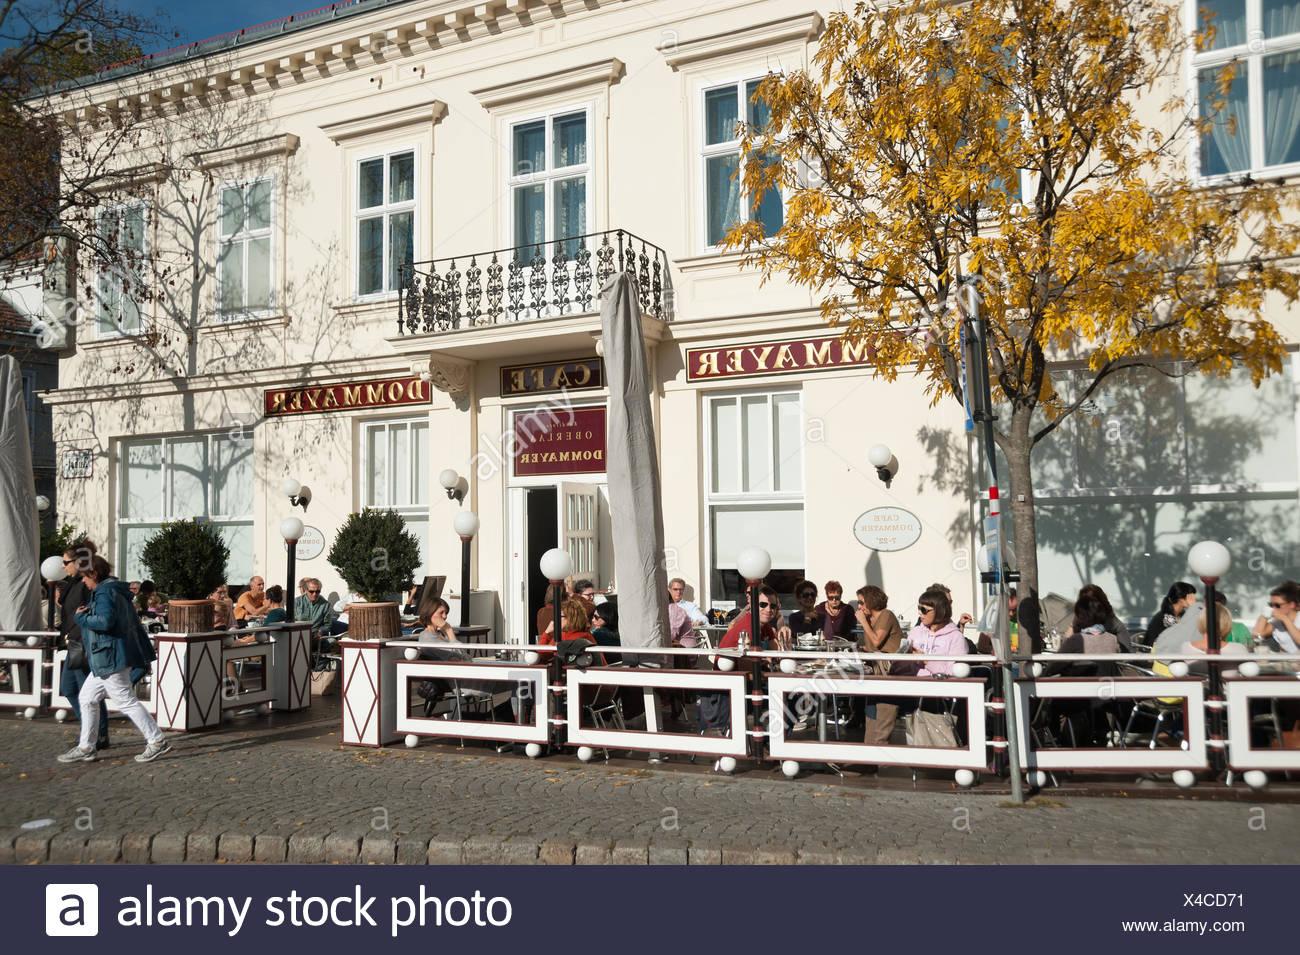 Wien, Hietzing, Cafe Dommayer - Stock Image